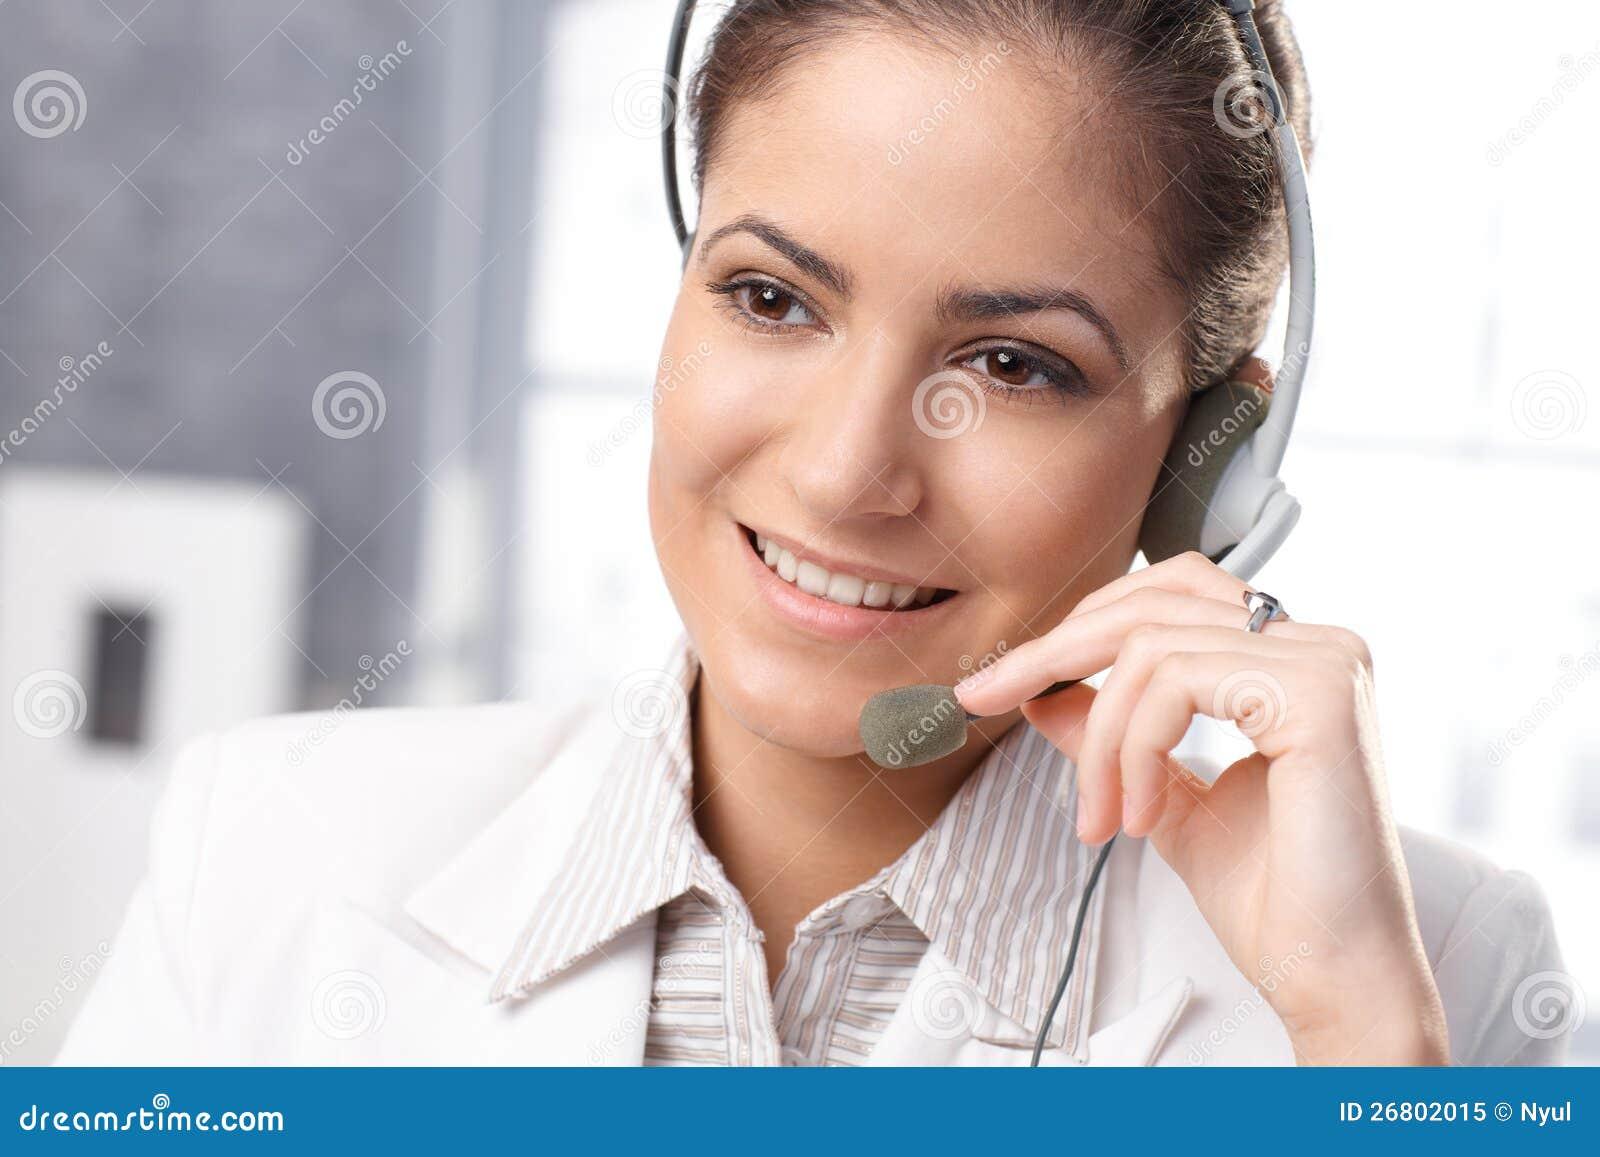 Smiling Customer Service Representative Royalty Free Stock